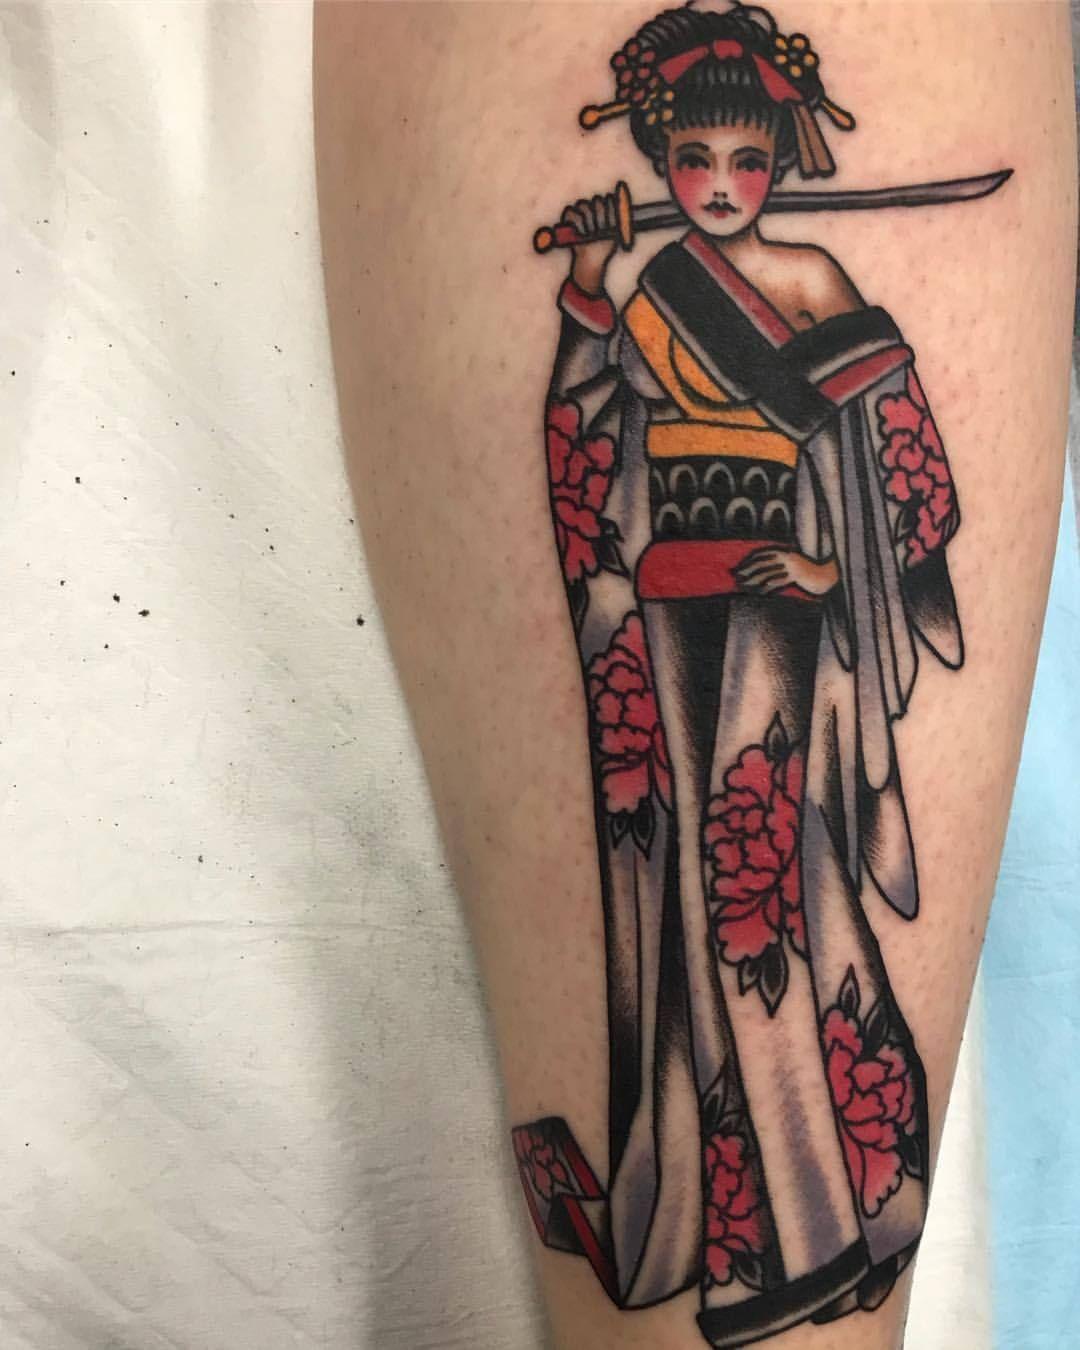 American Traditional Tattoo Japanese Geisha Samurai Traditional Japanese Tattoo Sleeve Traditional Japanese Tattoos Neo Traditional Tattoo